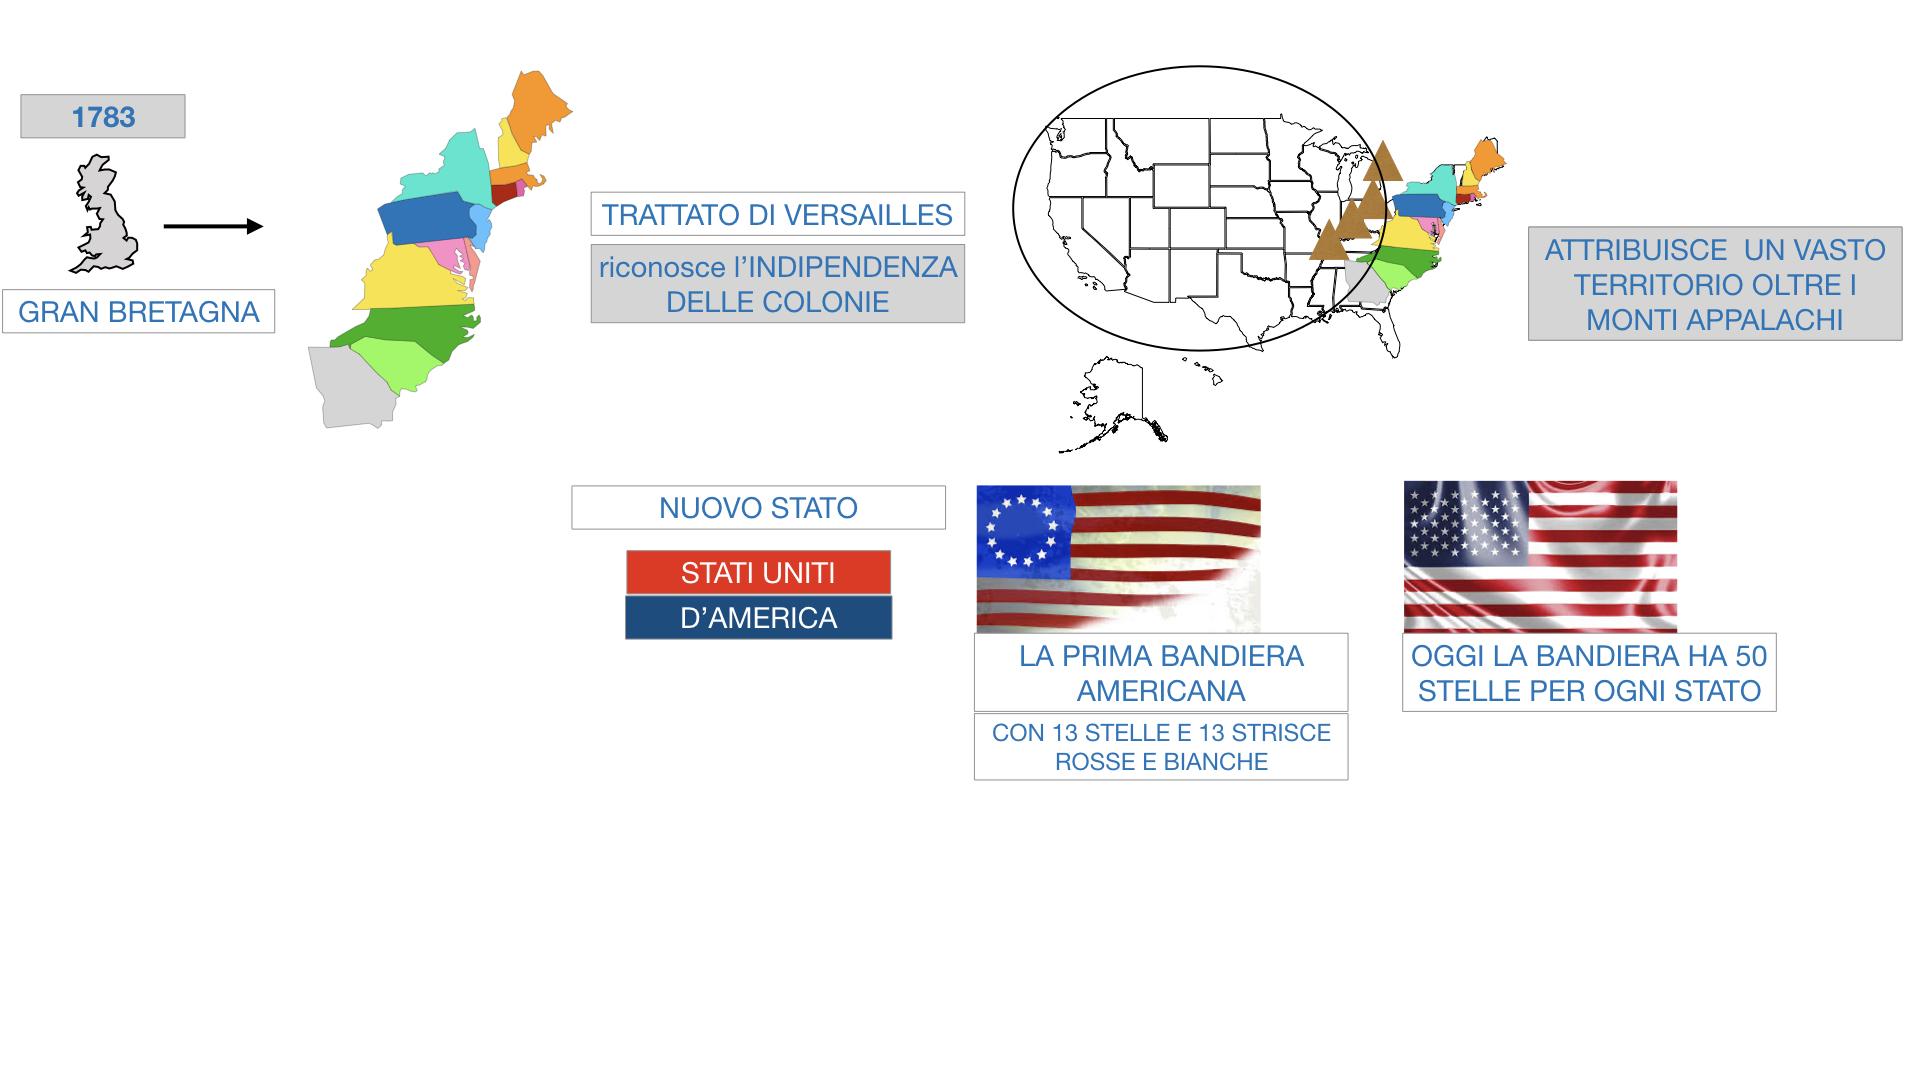 GUERRA DI INDIPENDENZA AMERICANA_SIMULAZIONE.146